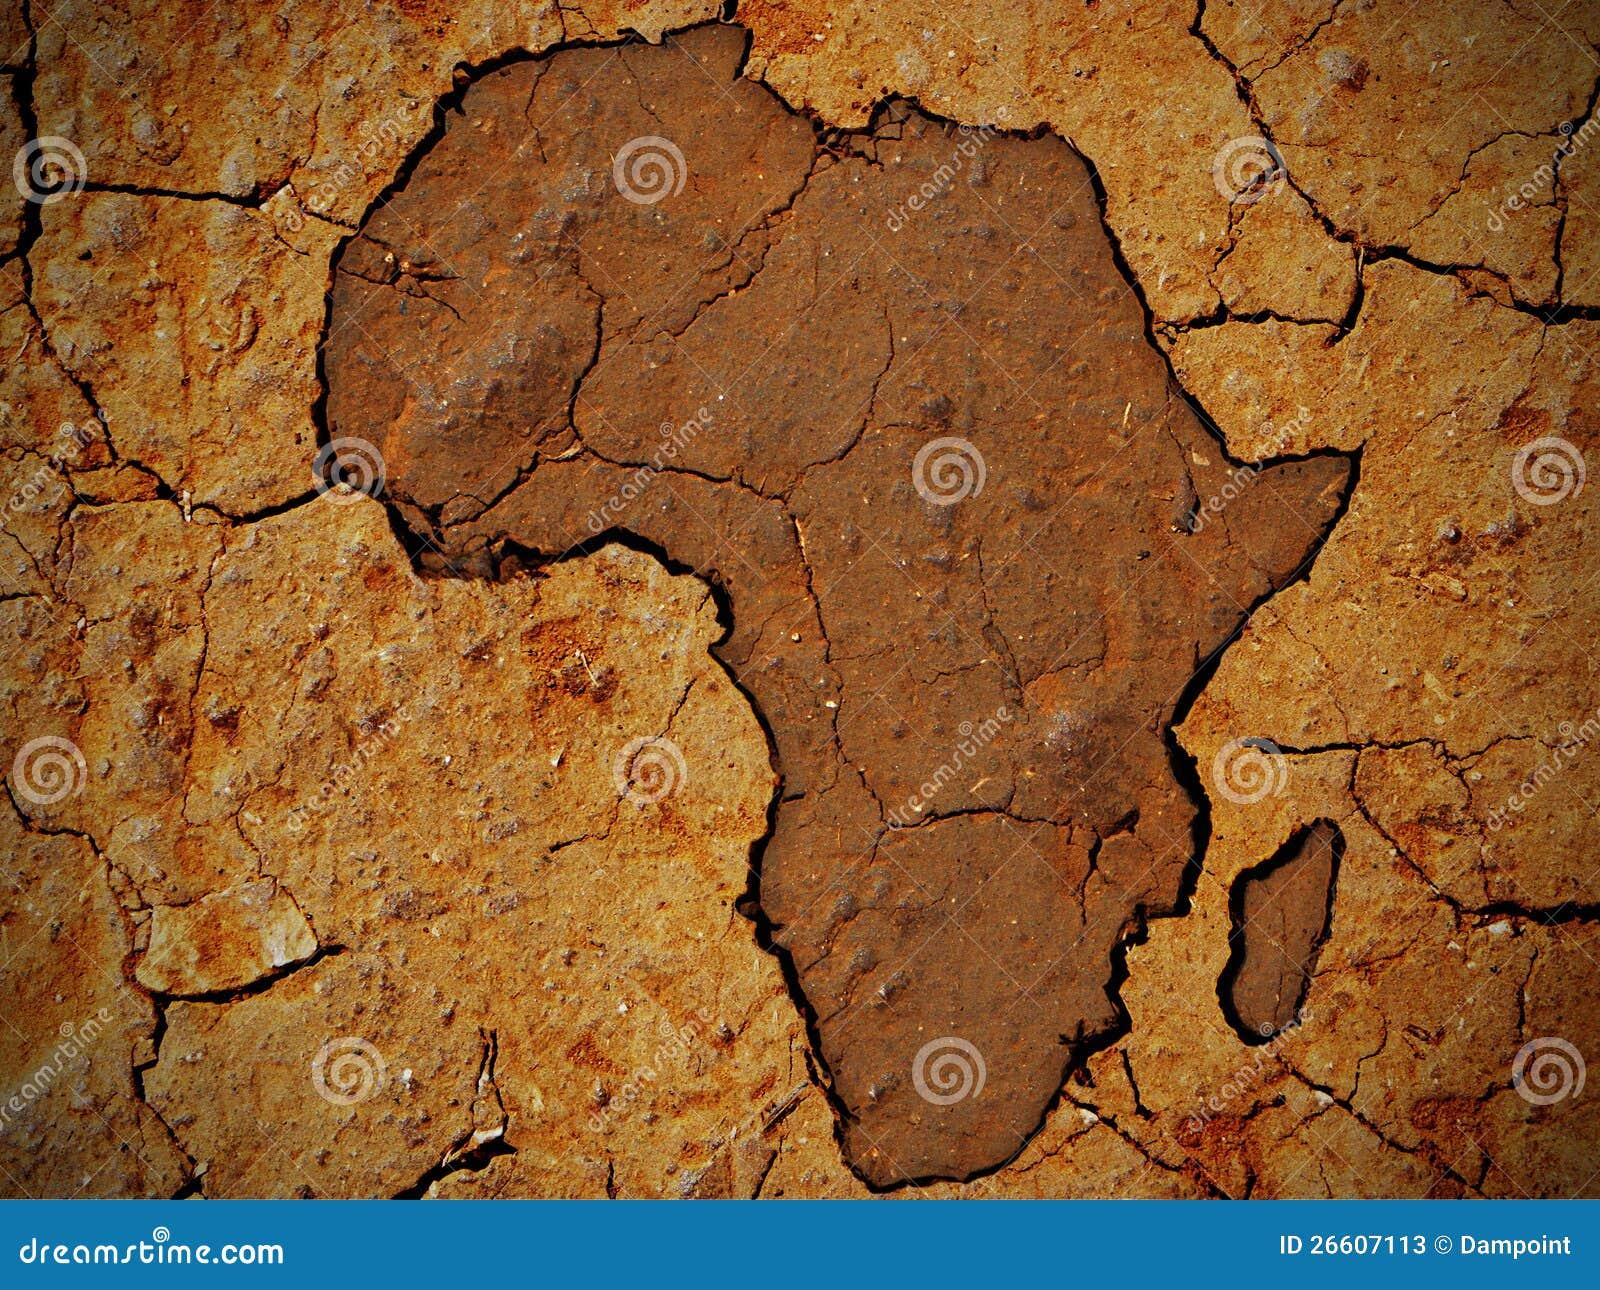 Free Video Africa Dry Sex 63